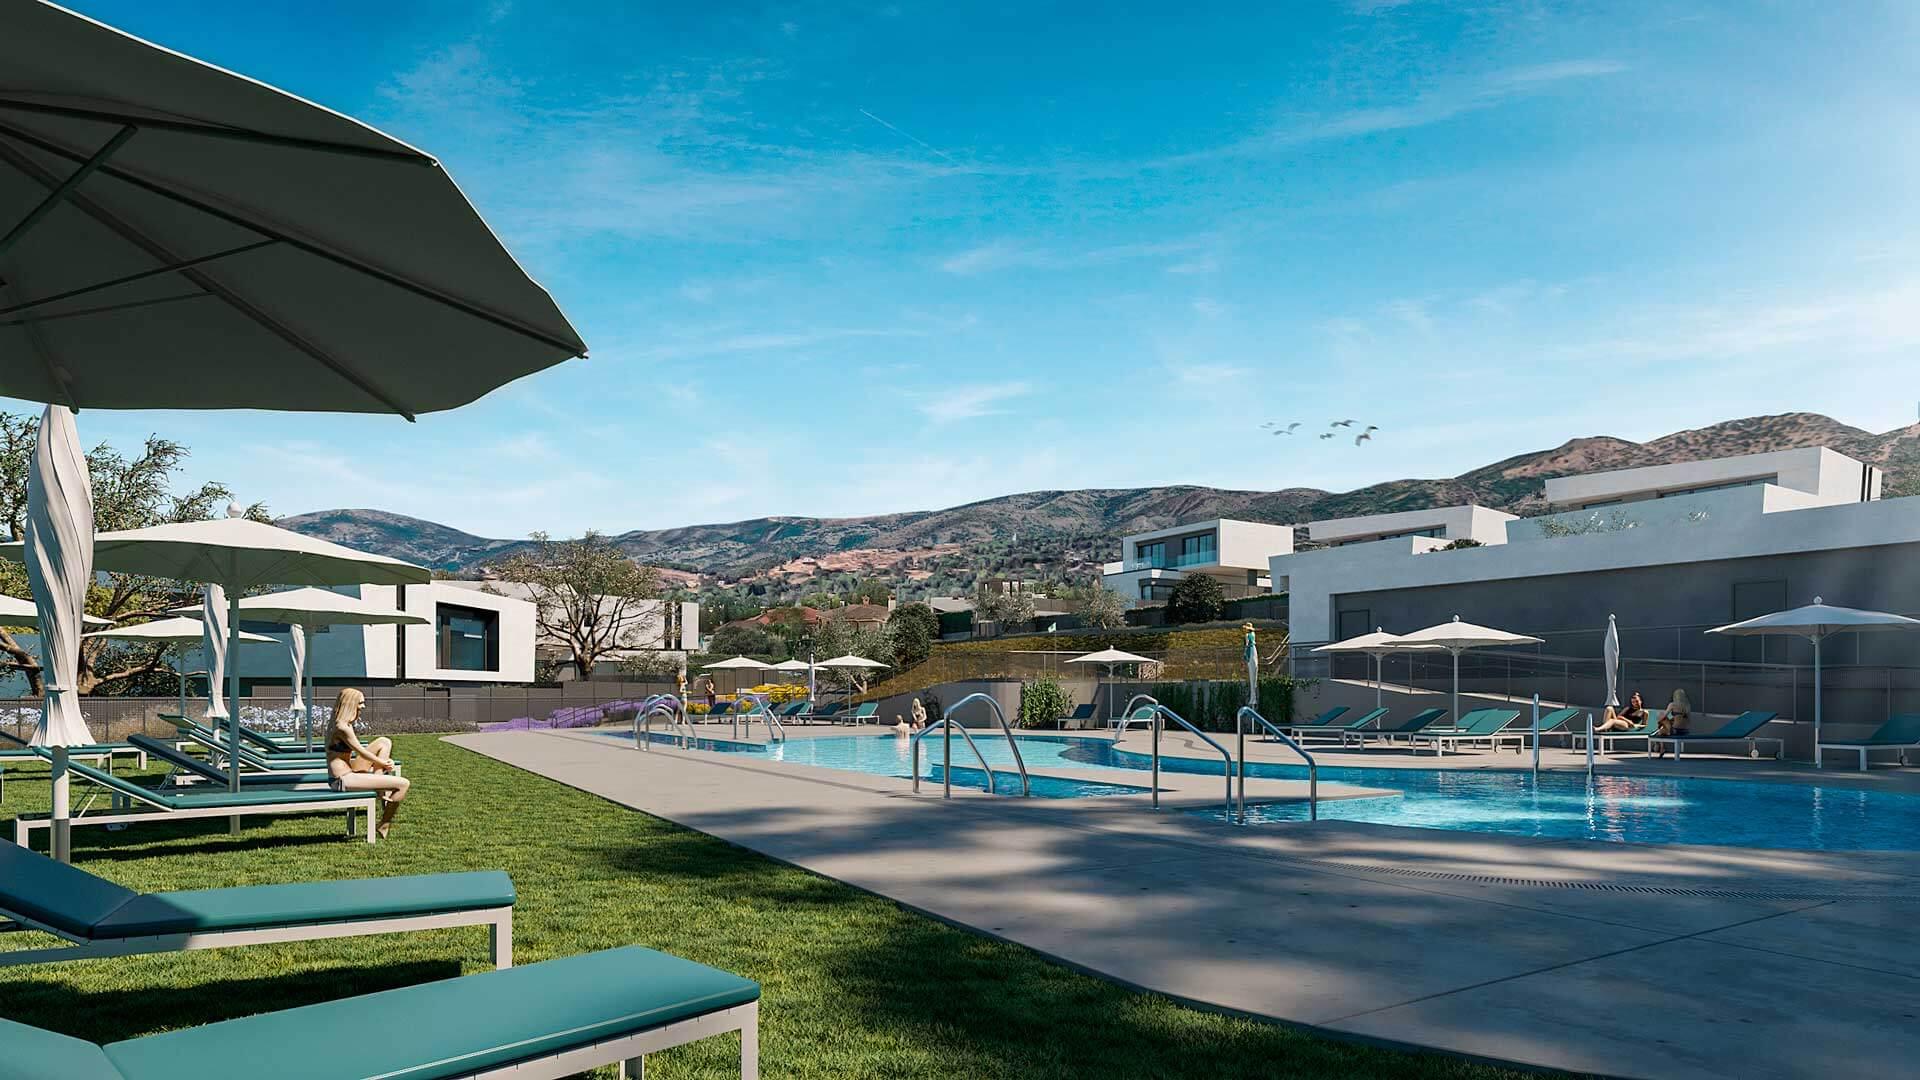 Villas de Alhaken metrovacesa obra nueva en cordoba